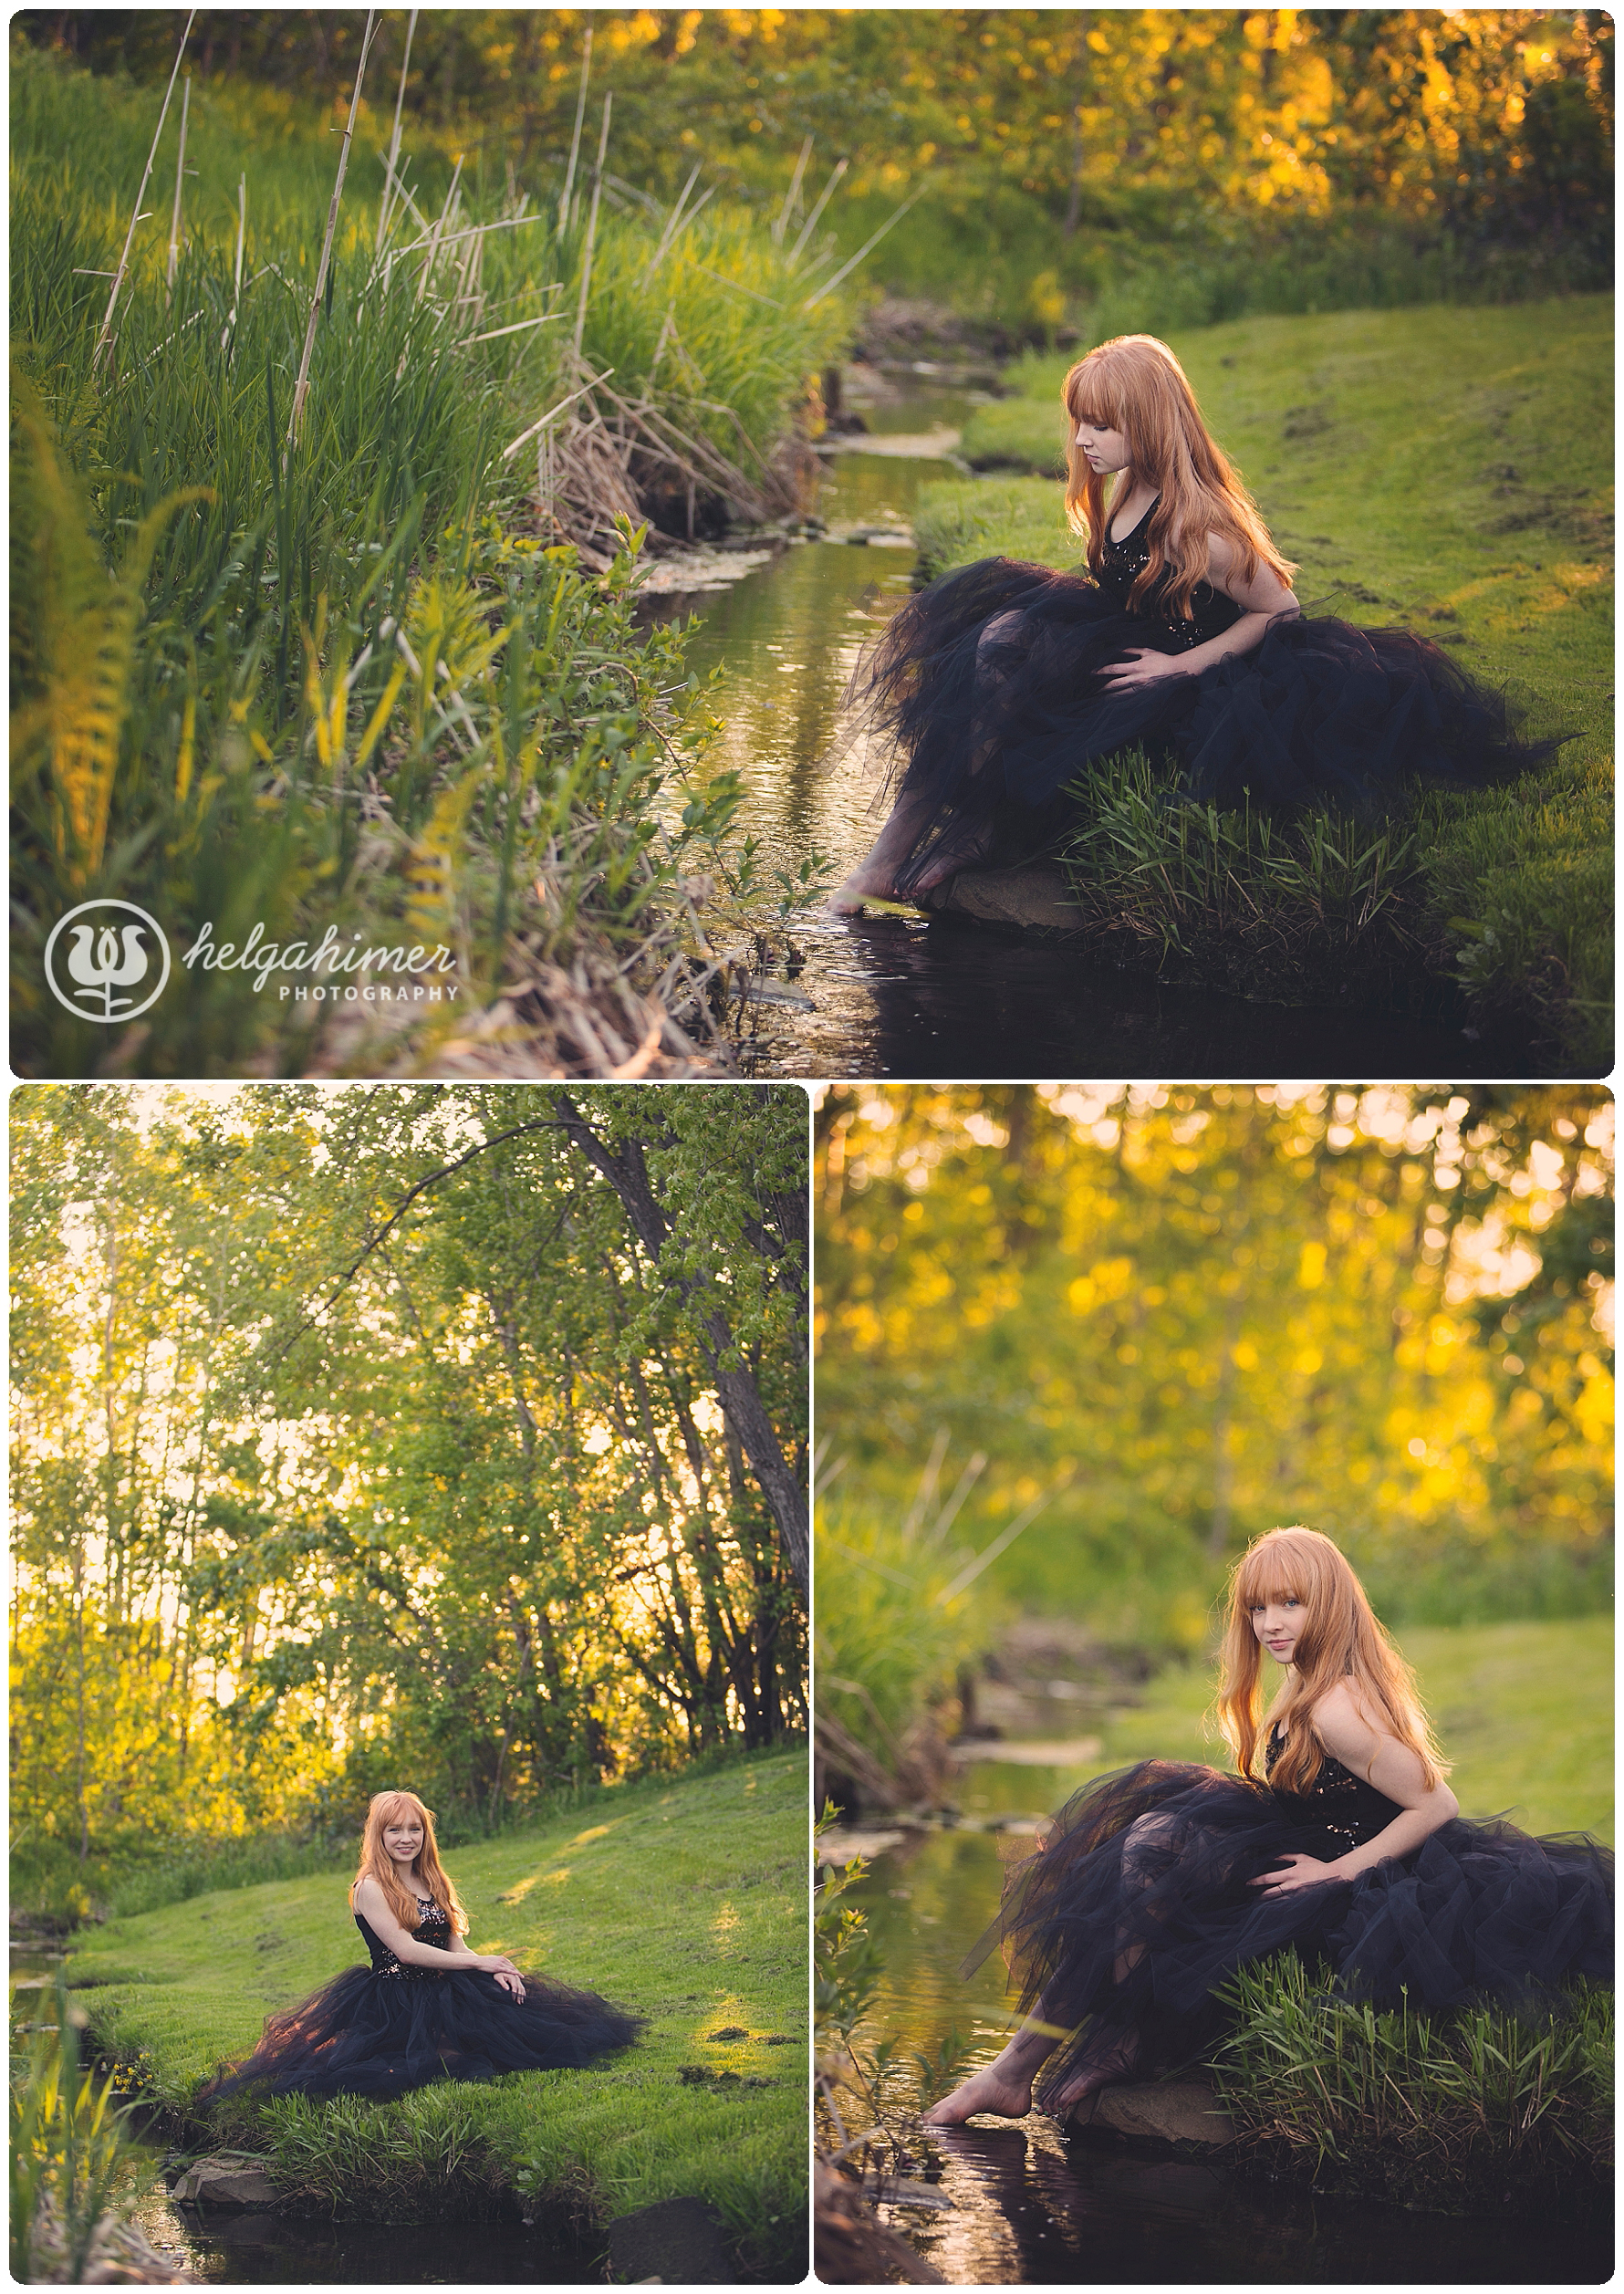 er-photography-sudbury-professional-photographer-personal-branding-cherry-blossom-senior-photo-girl-model-teen-at-the-water-stream